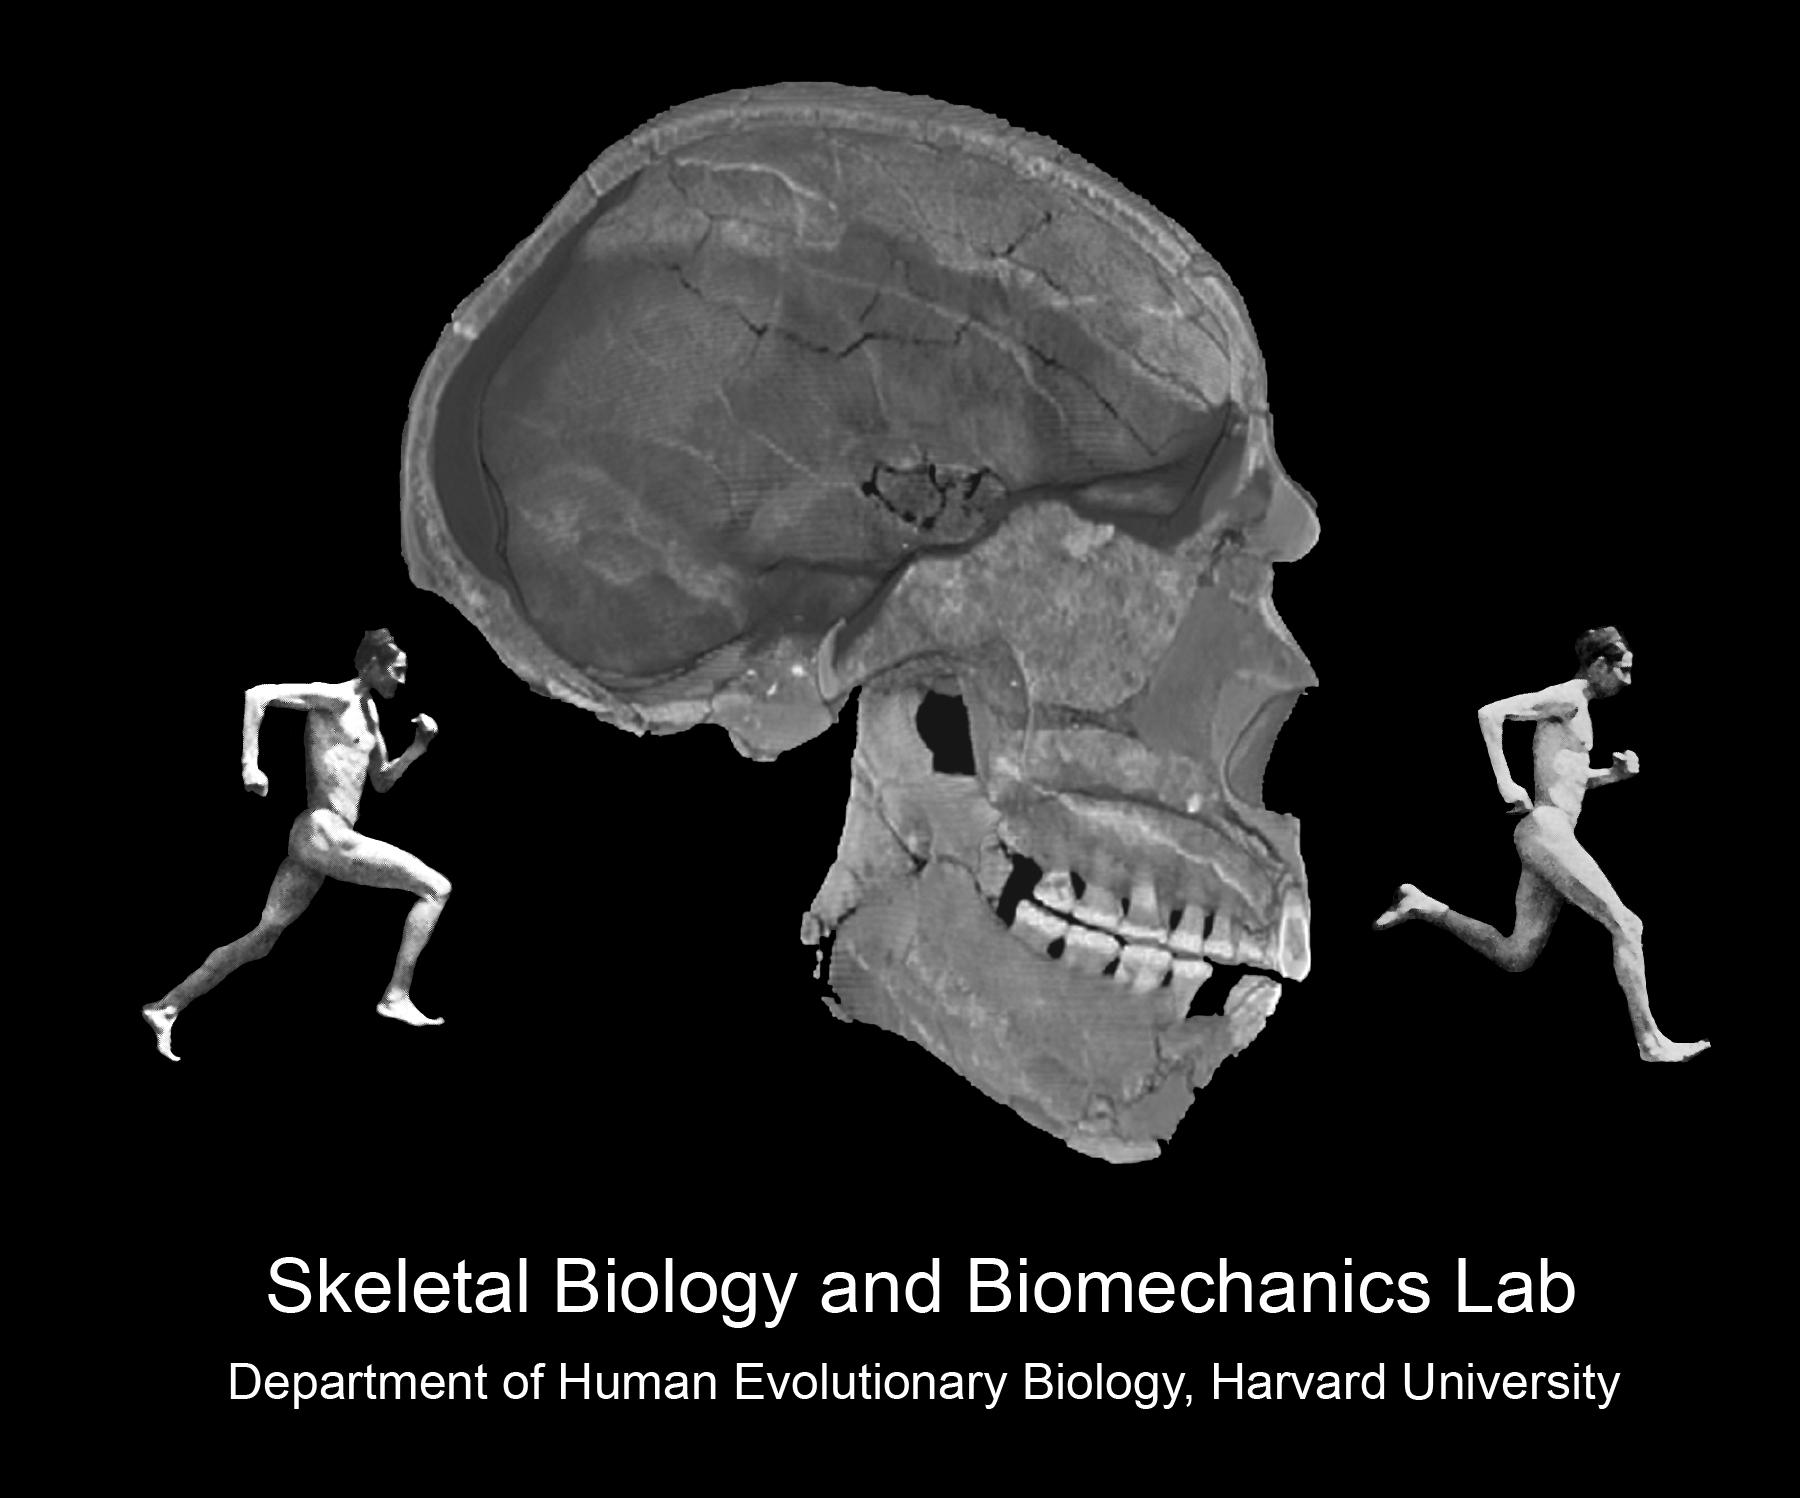 Harvard University Skeletal Biology and Biomechanics Lab